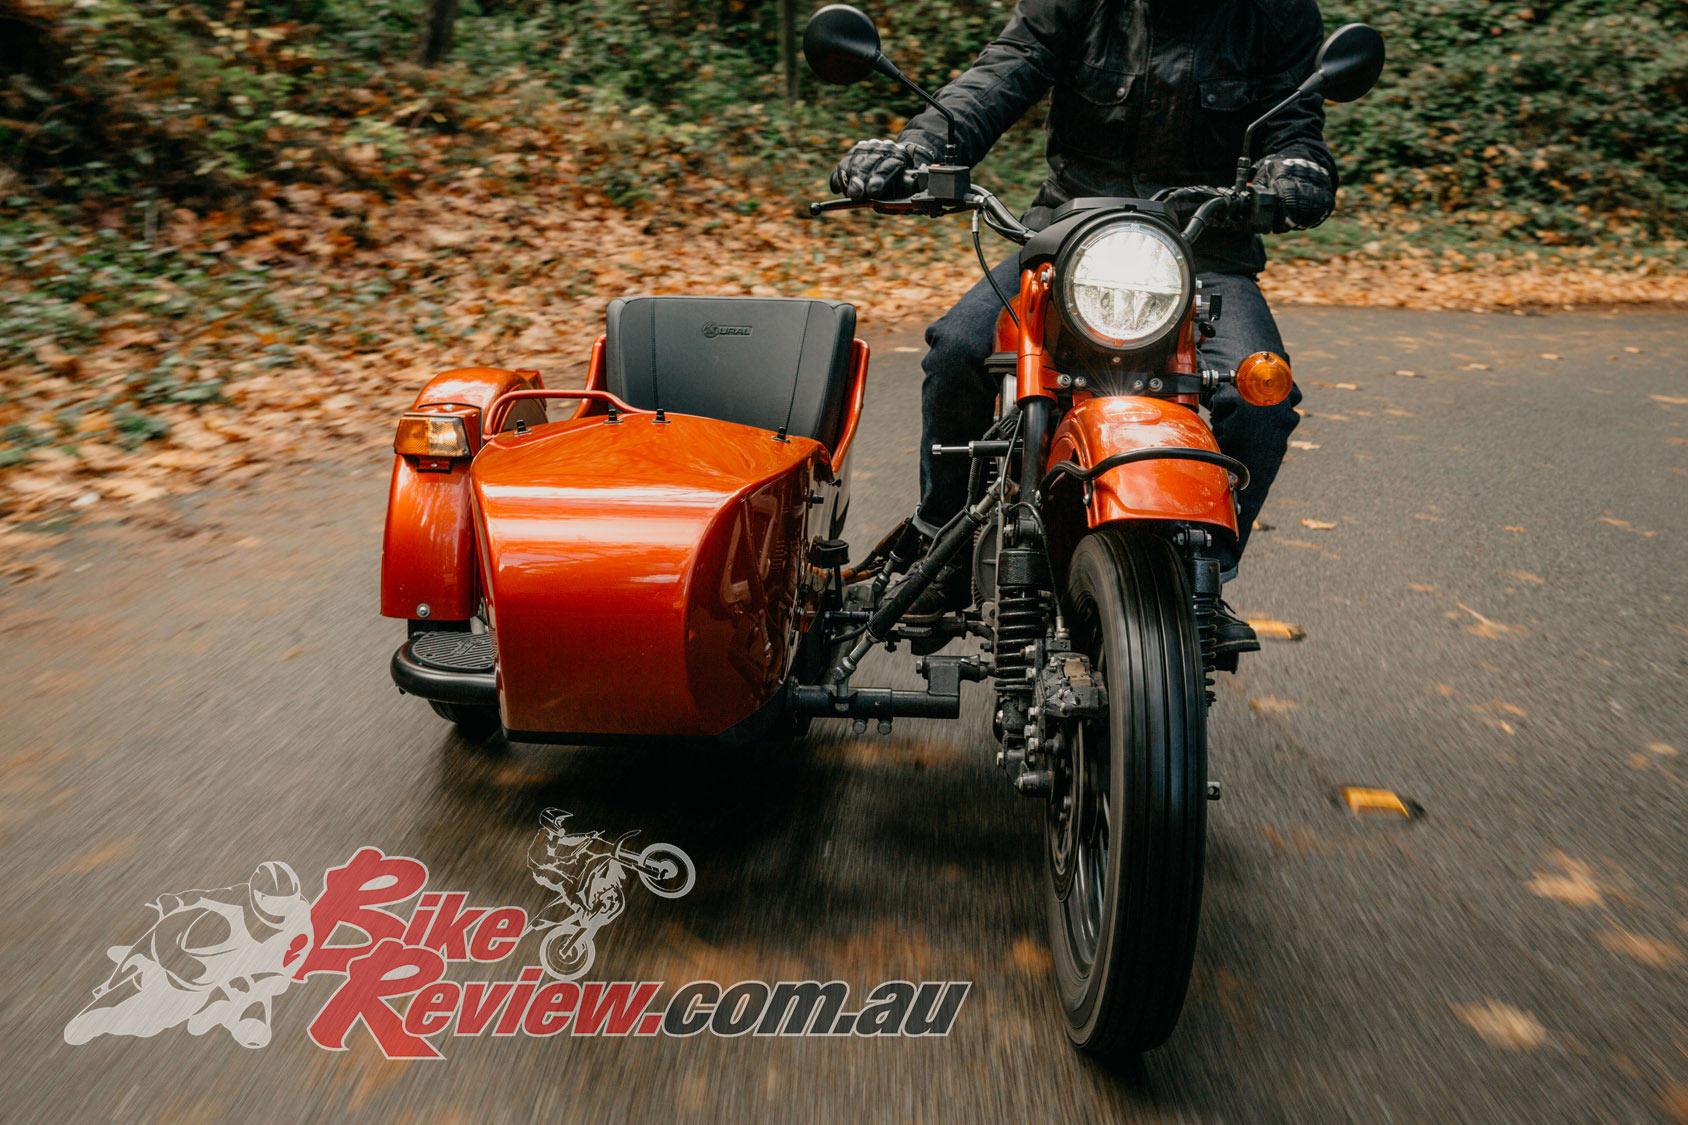 electric ural sidecar prototype bike review. Black Bedroom Furniture Sets. Home Design Ideas